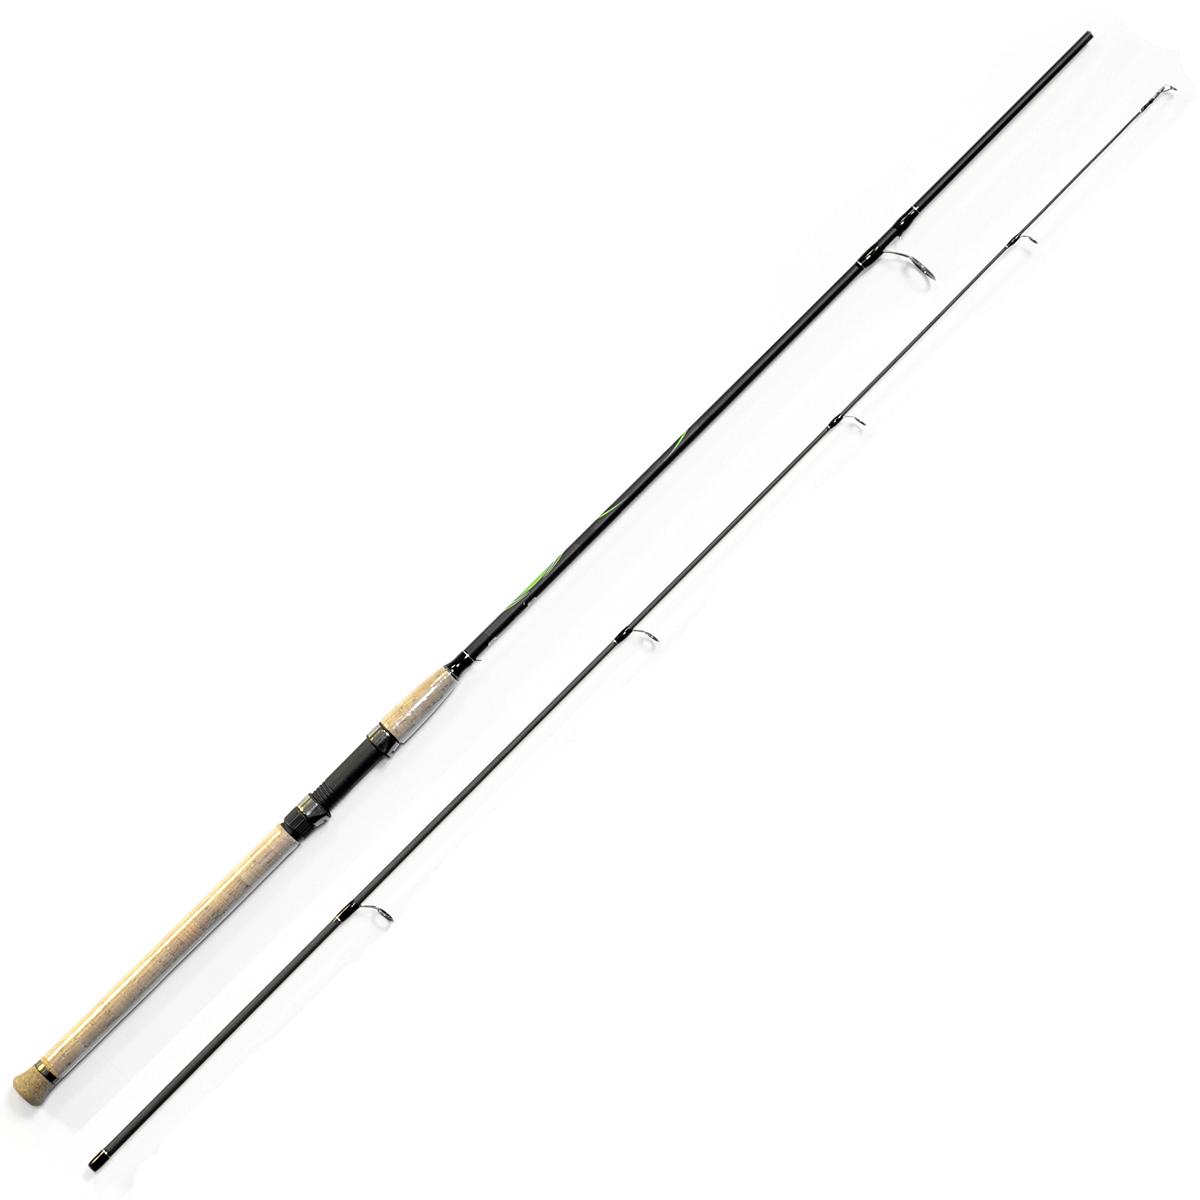 Спиннинг Salmo Sniper, 2,4 м, 5-20 г спиннинг штекерный salmo taifun 40 2 1 м 10 40 г